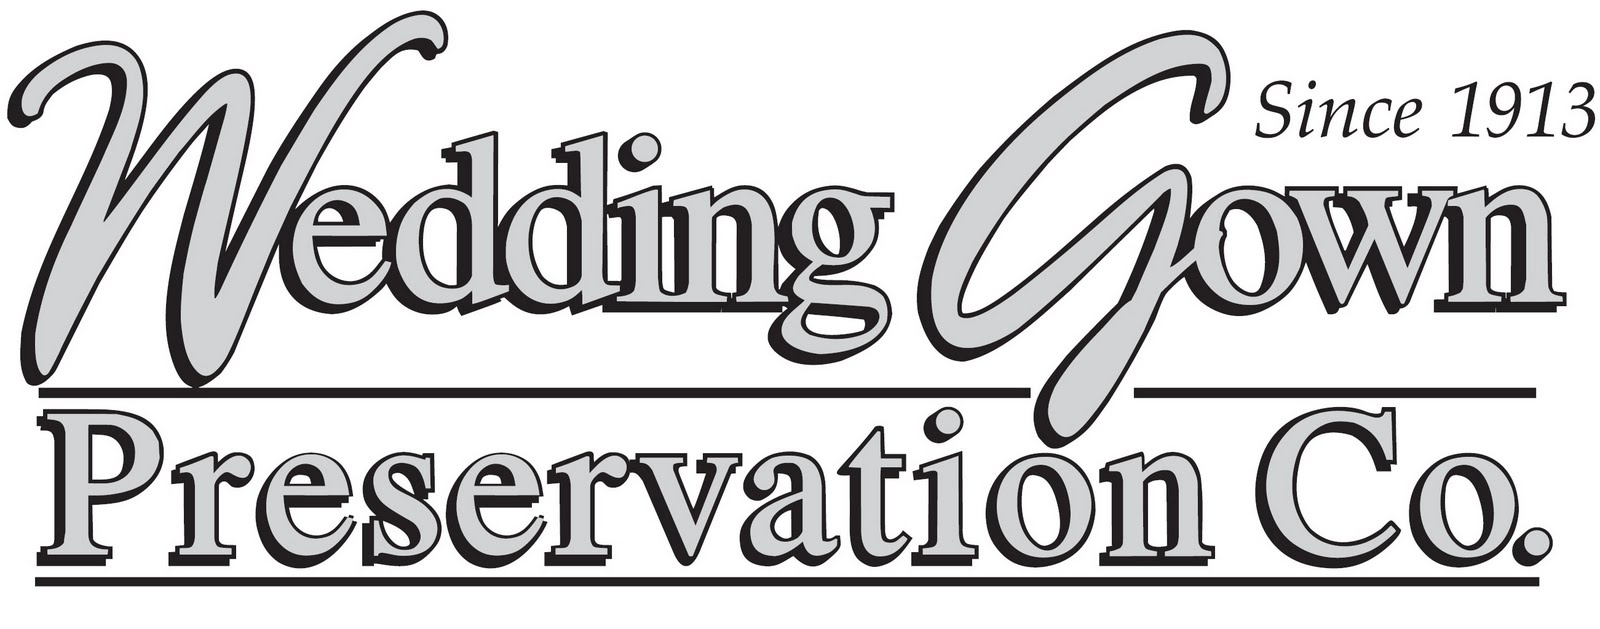 Jane allen events wedding gown preservation for Wedding dress preservation chicago